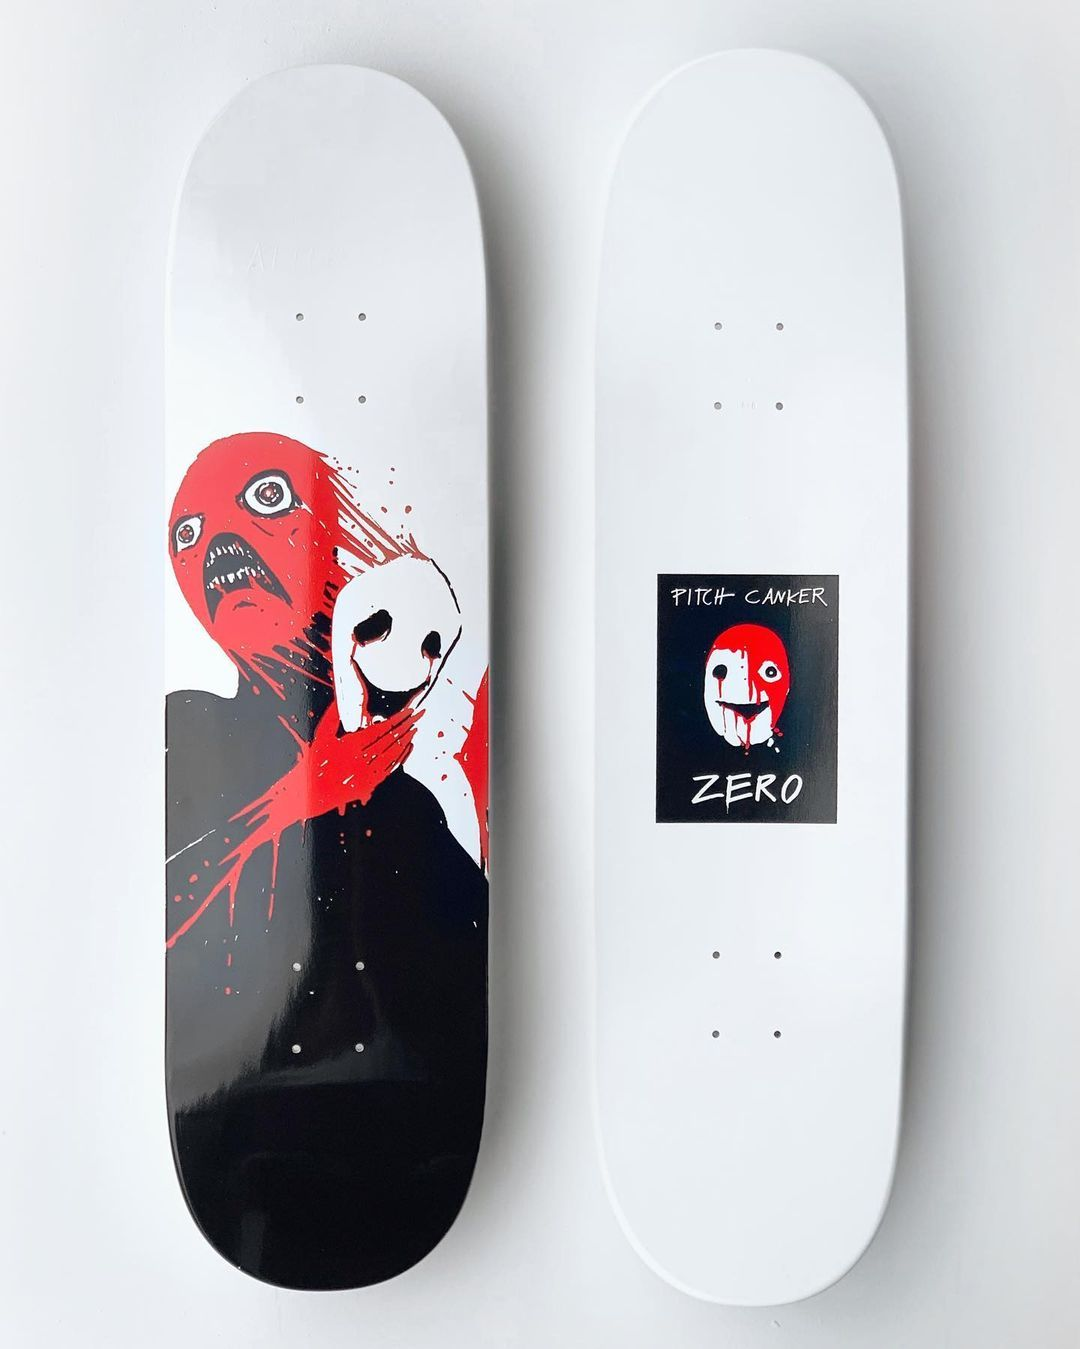 Pitch Canker X Zero Skateboards 11